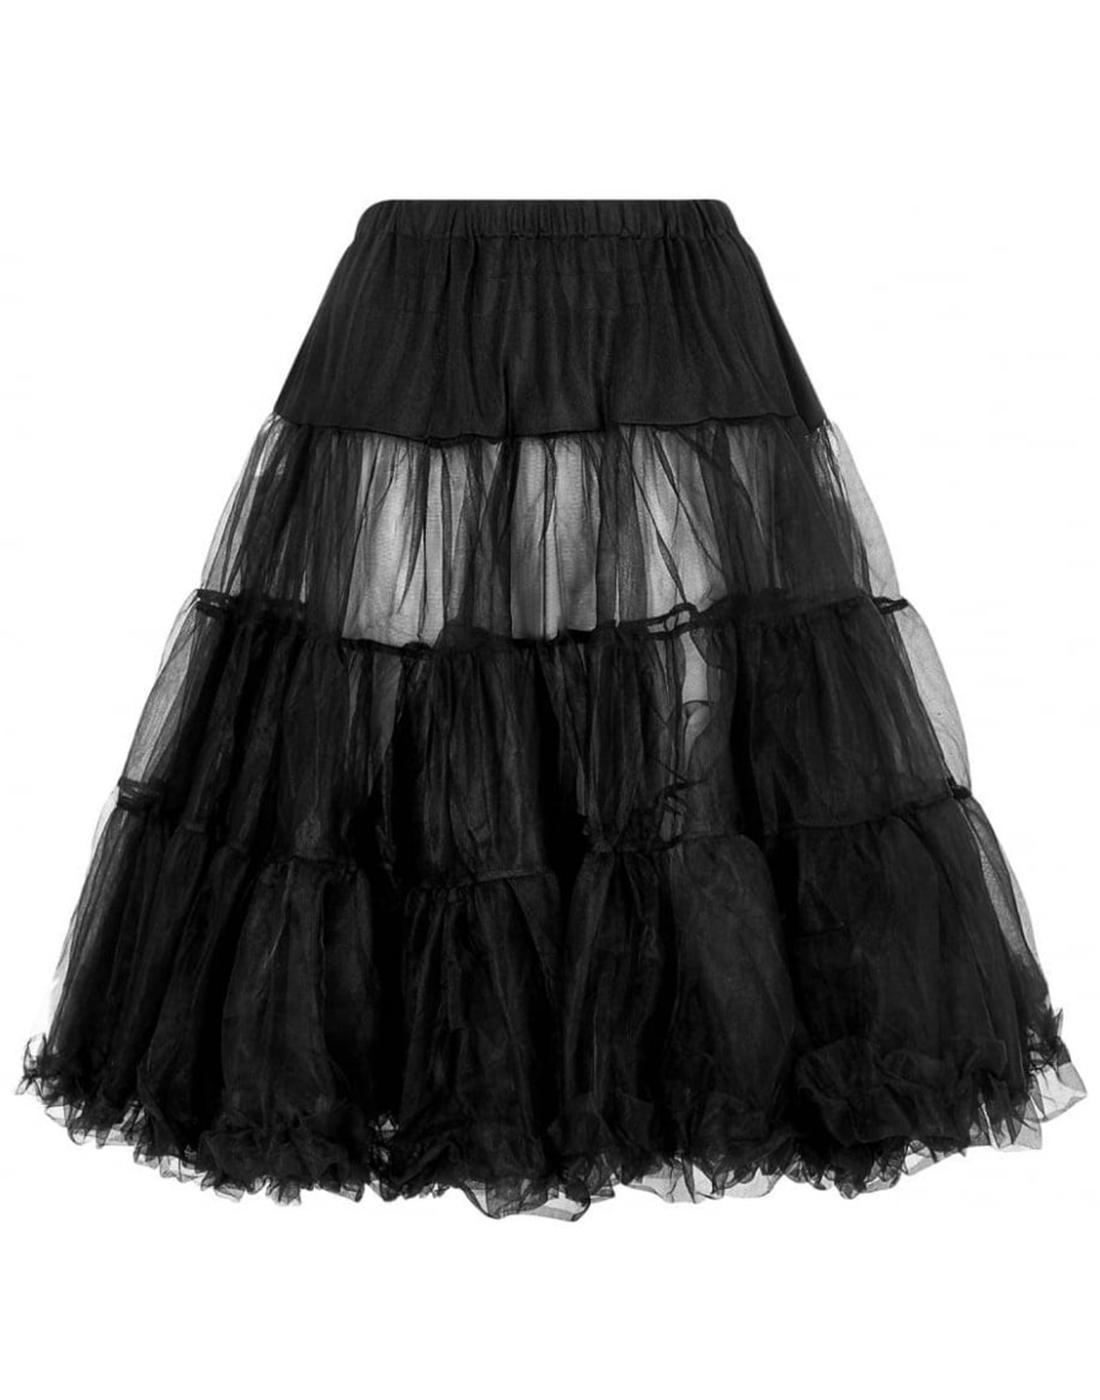 Maddy COLLECTIF Retro Vintage Petticoat in Black